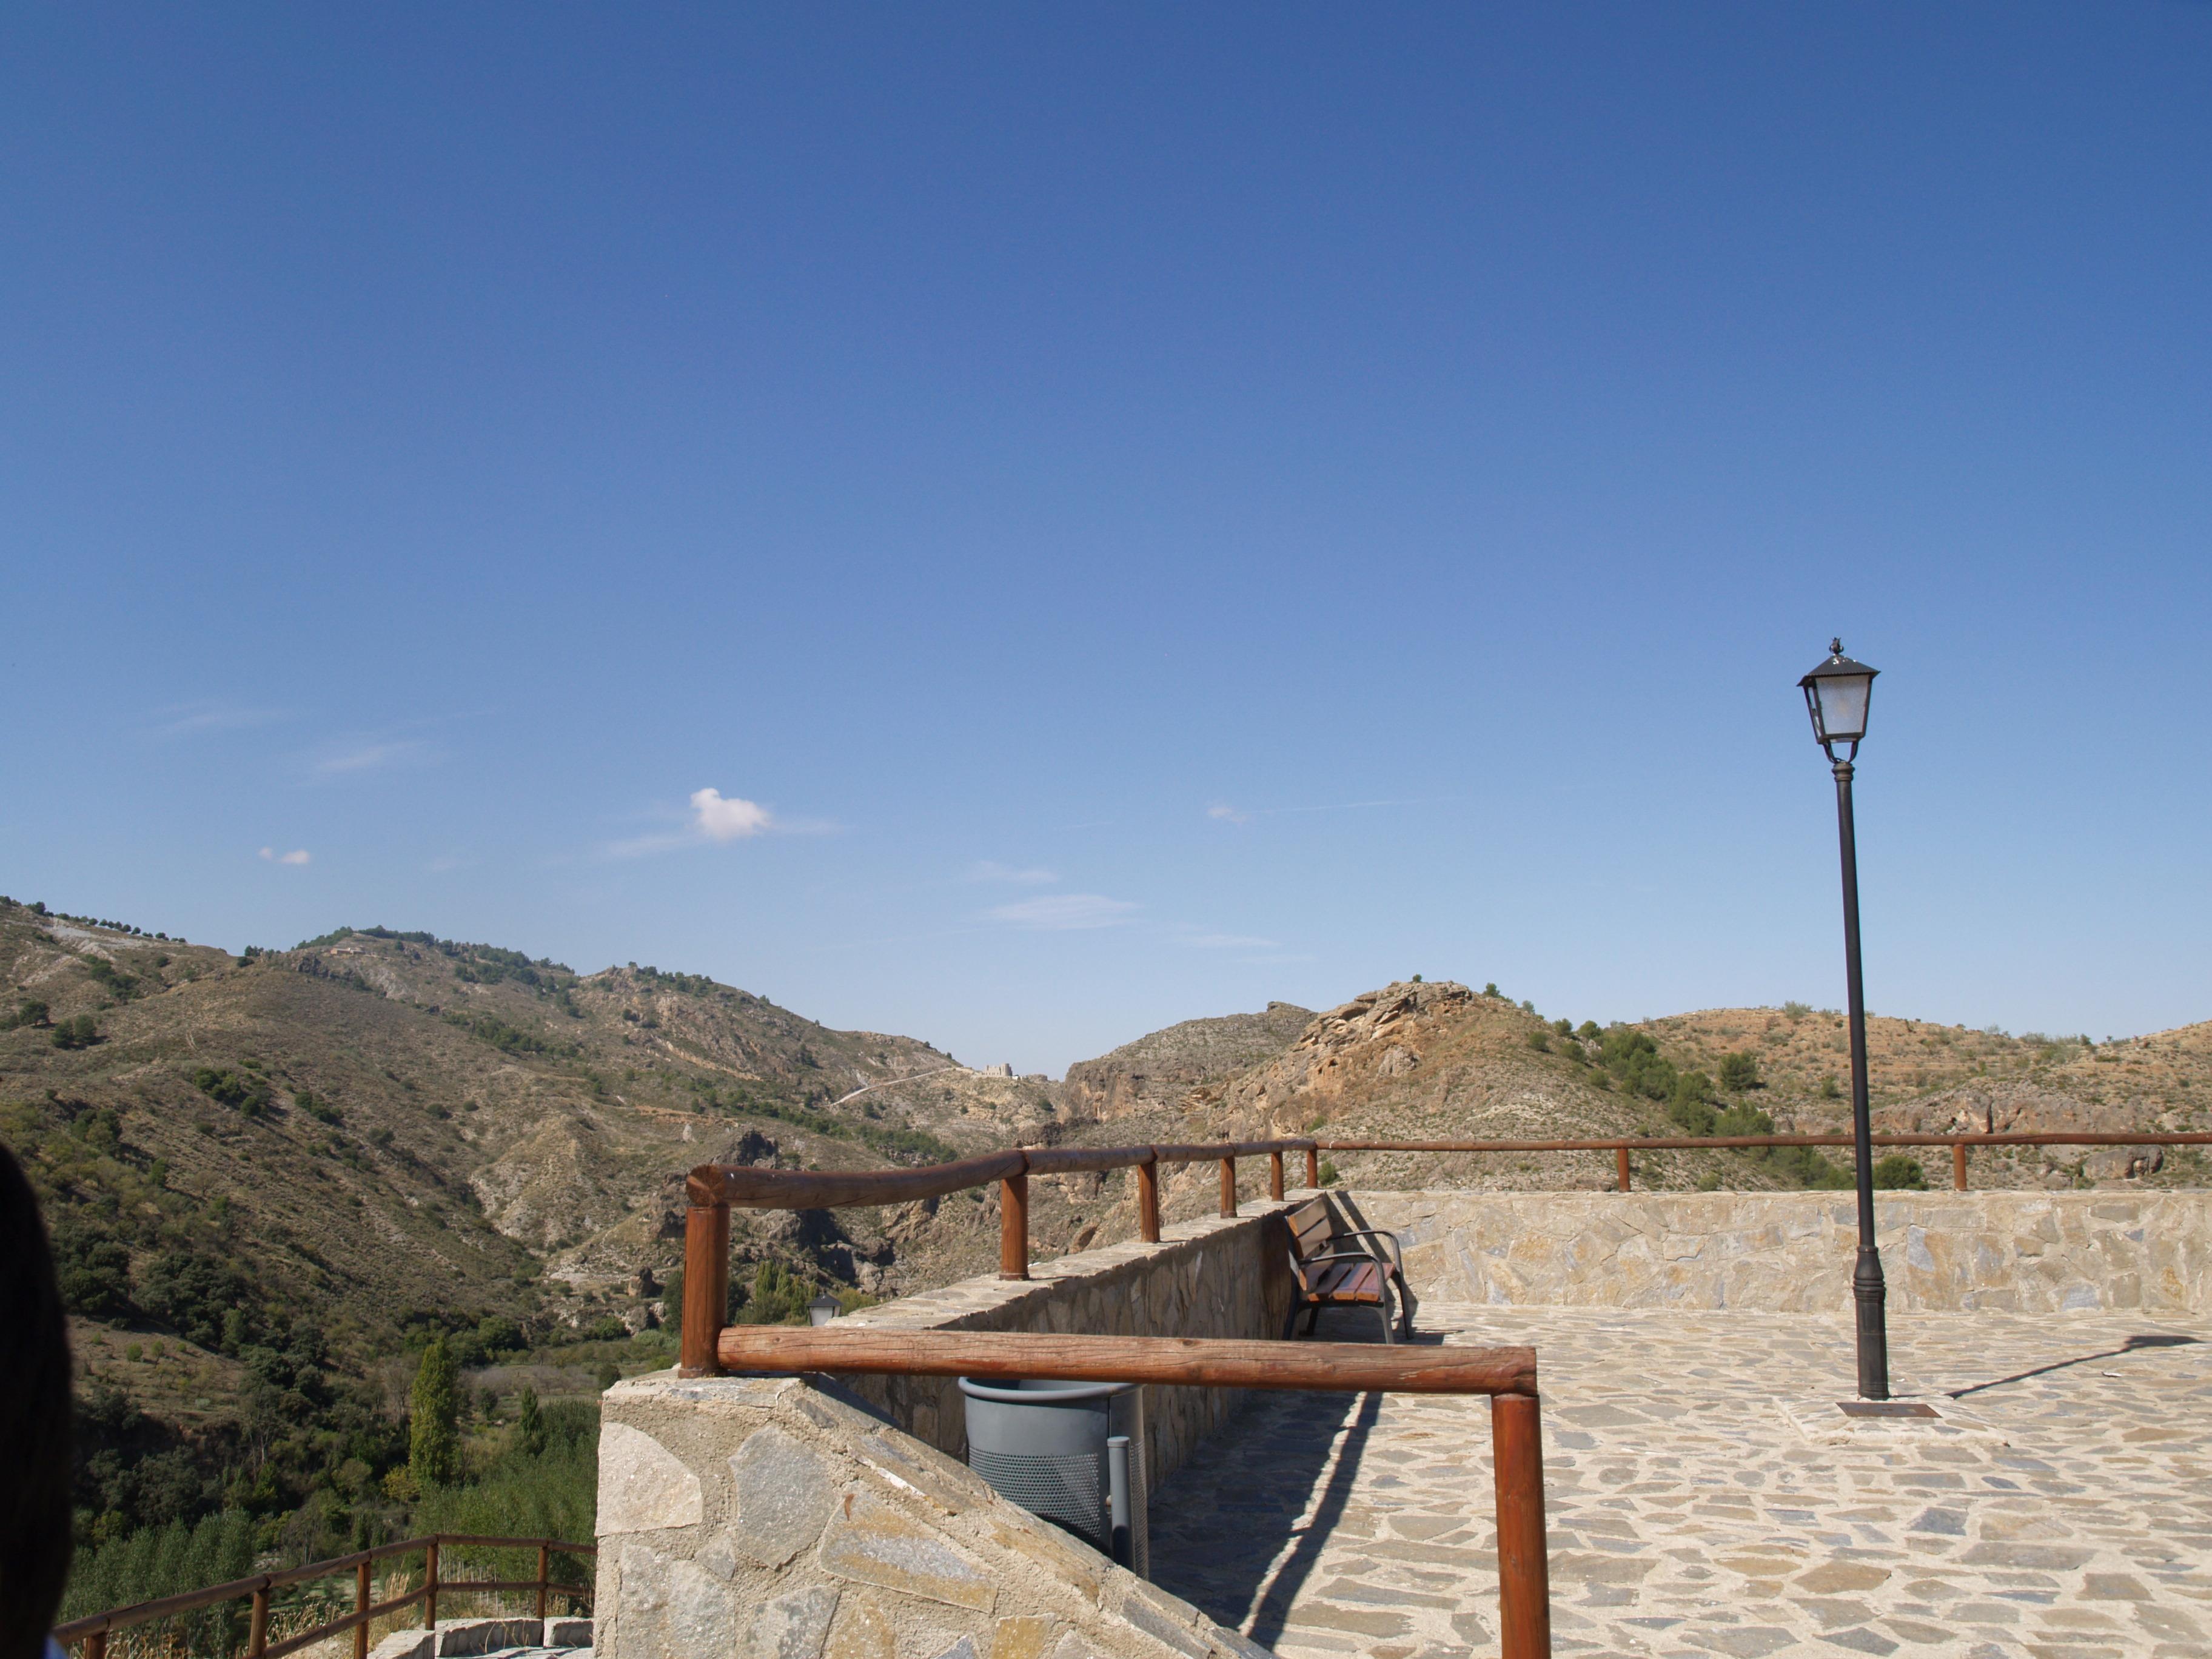 Mirador de Bayarque